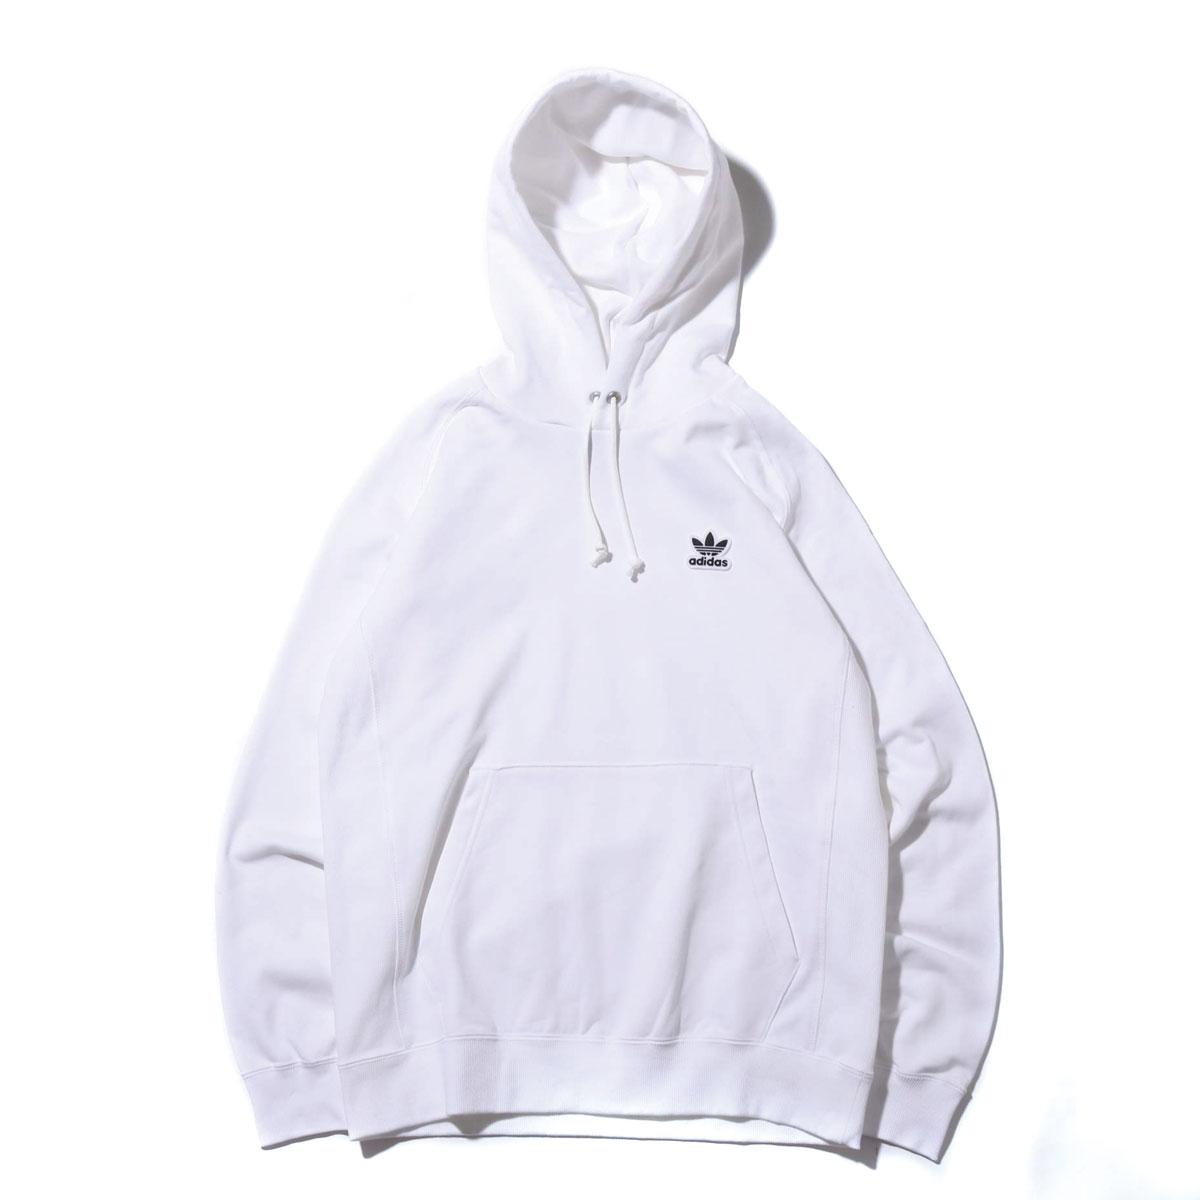 adidas Originals AC WAPPEN HOODIE(アディダスオリジナルス AC ワッペン フーディー)WHITE【メンズ パーカー】19SS-I